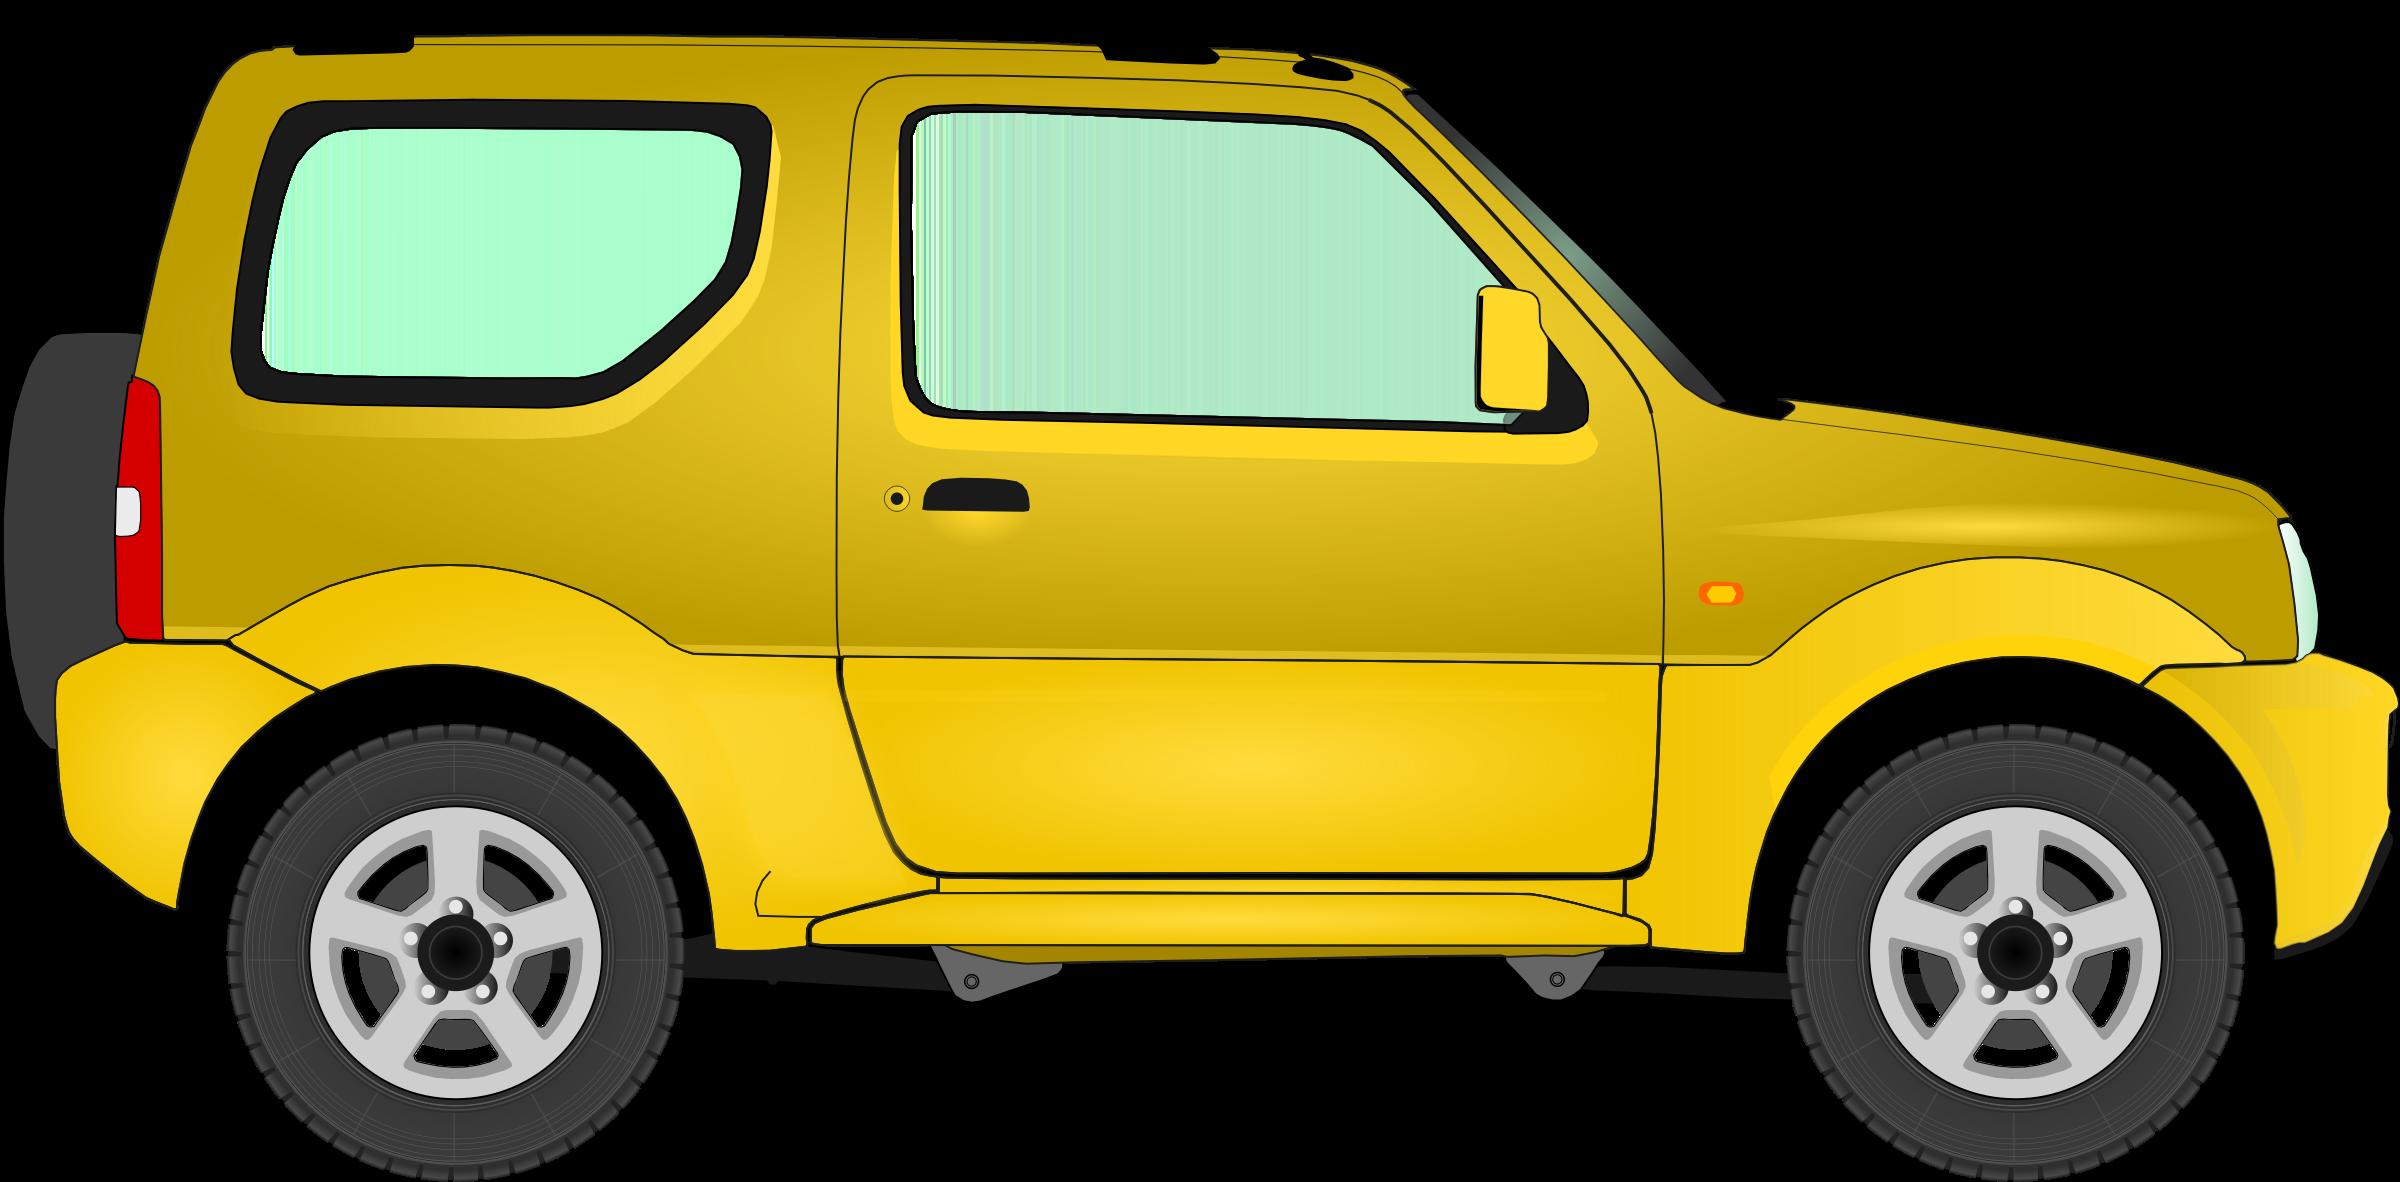 Big image png. Clipart car yellow